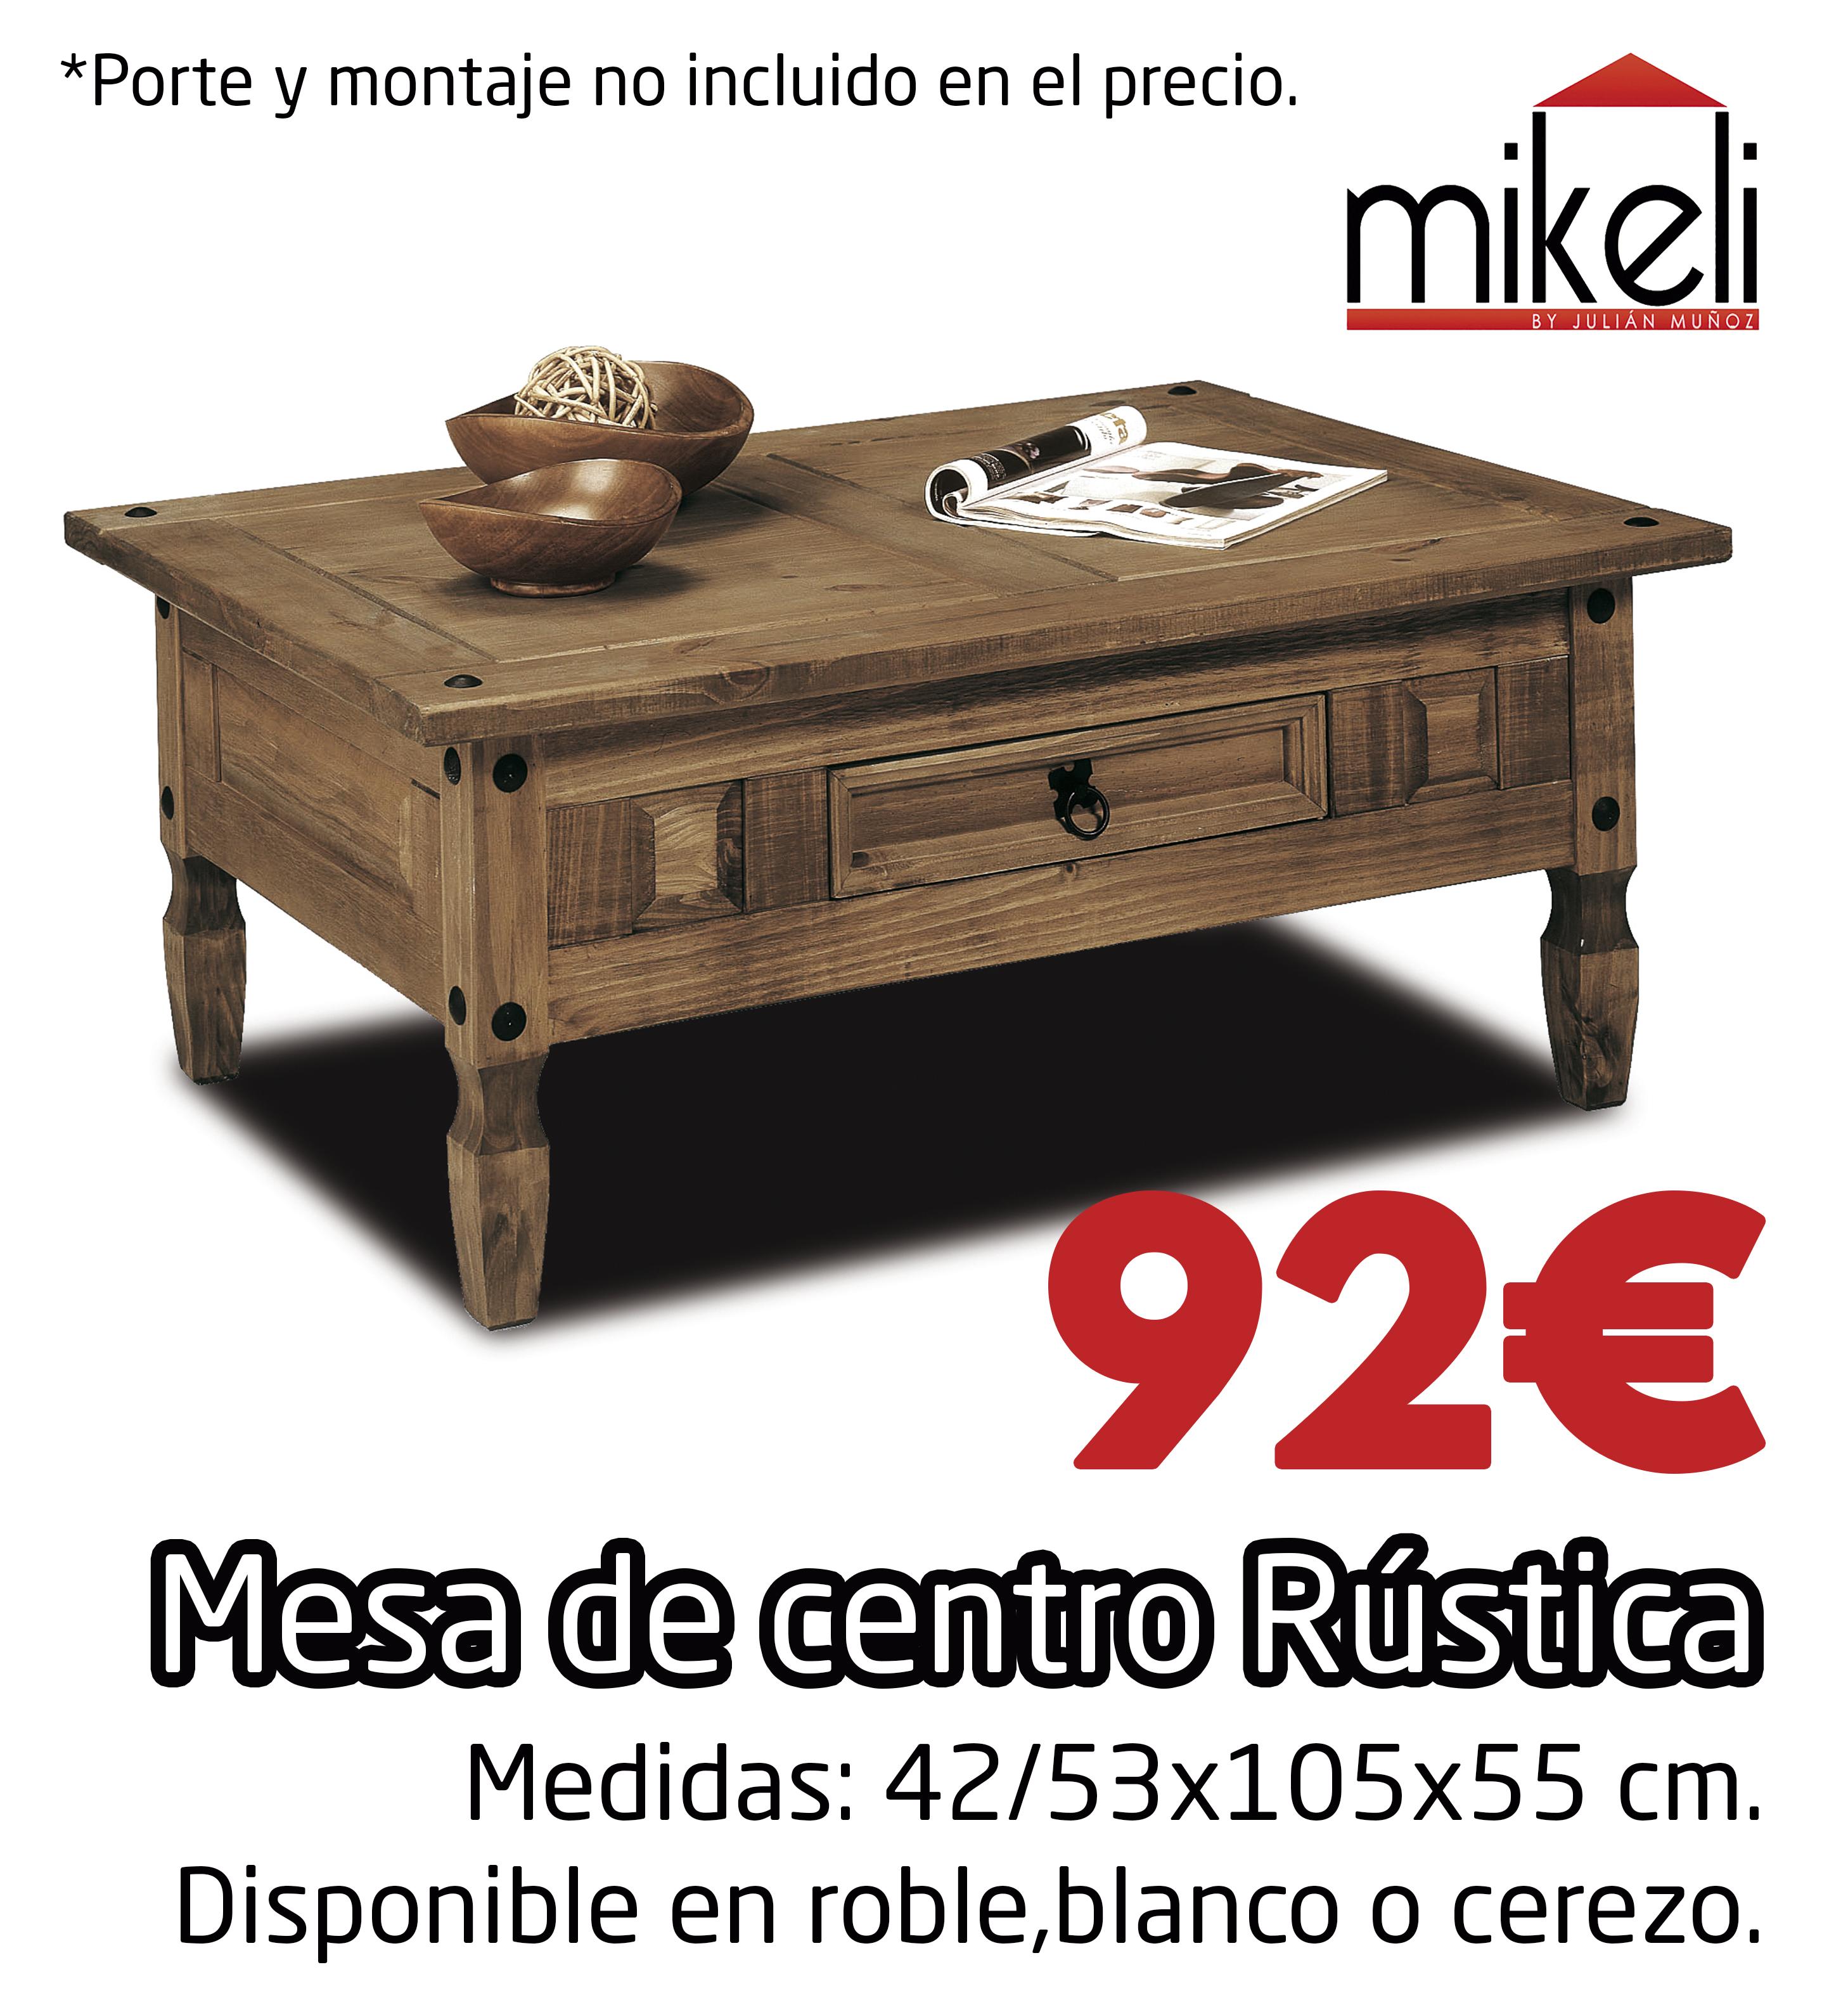 Mesa Centro Rustica Gilabert Mikeli Tu Tienda De Muebles A  # Muebles Gilabert